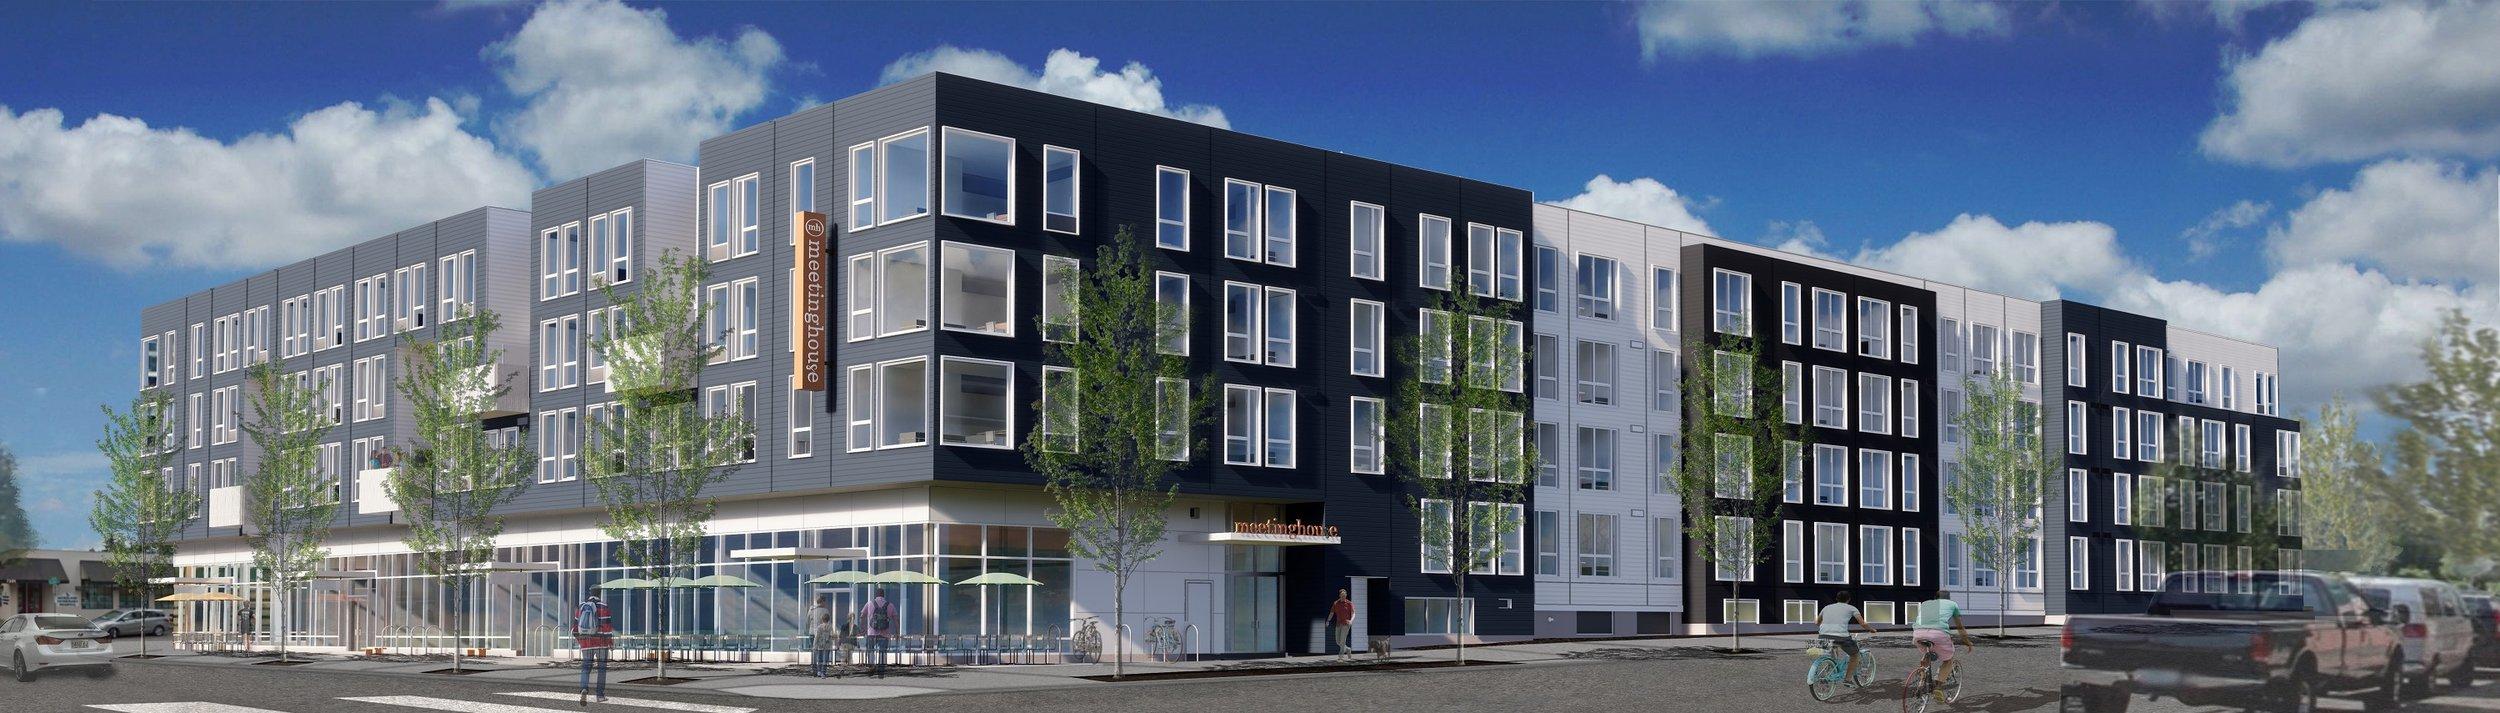 Meetinghouse Apartments Sellwood Moreland Portland Oregon Brand New Now Leasing Templeton - Templeton.jpg